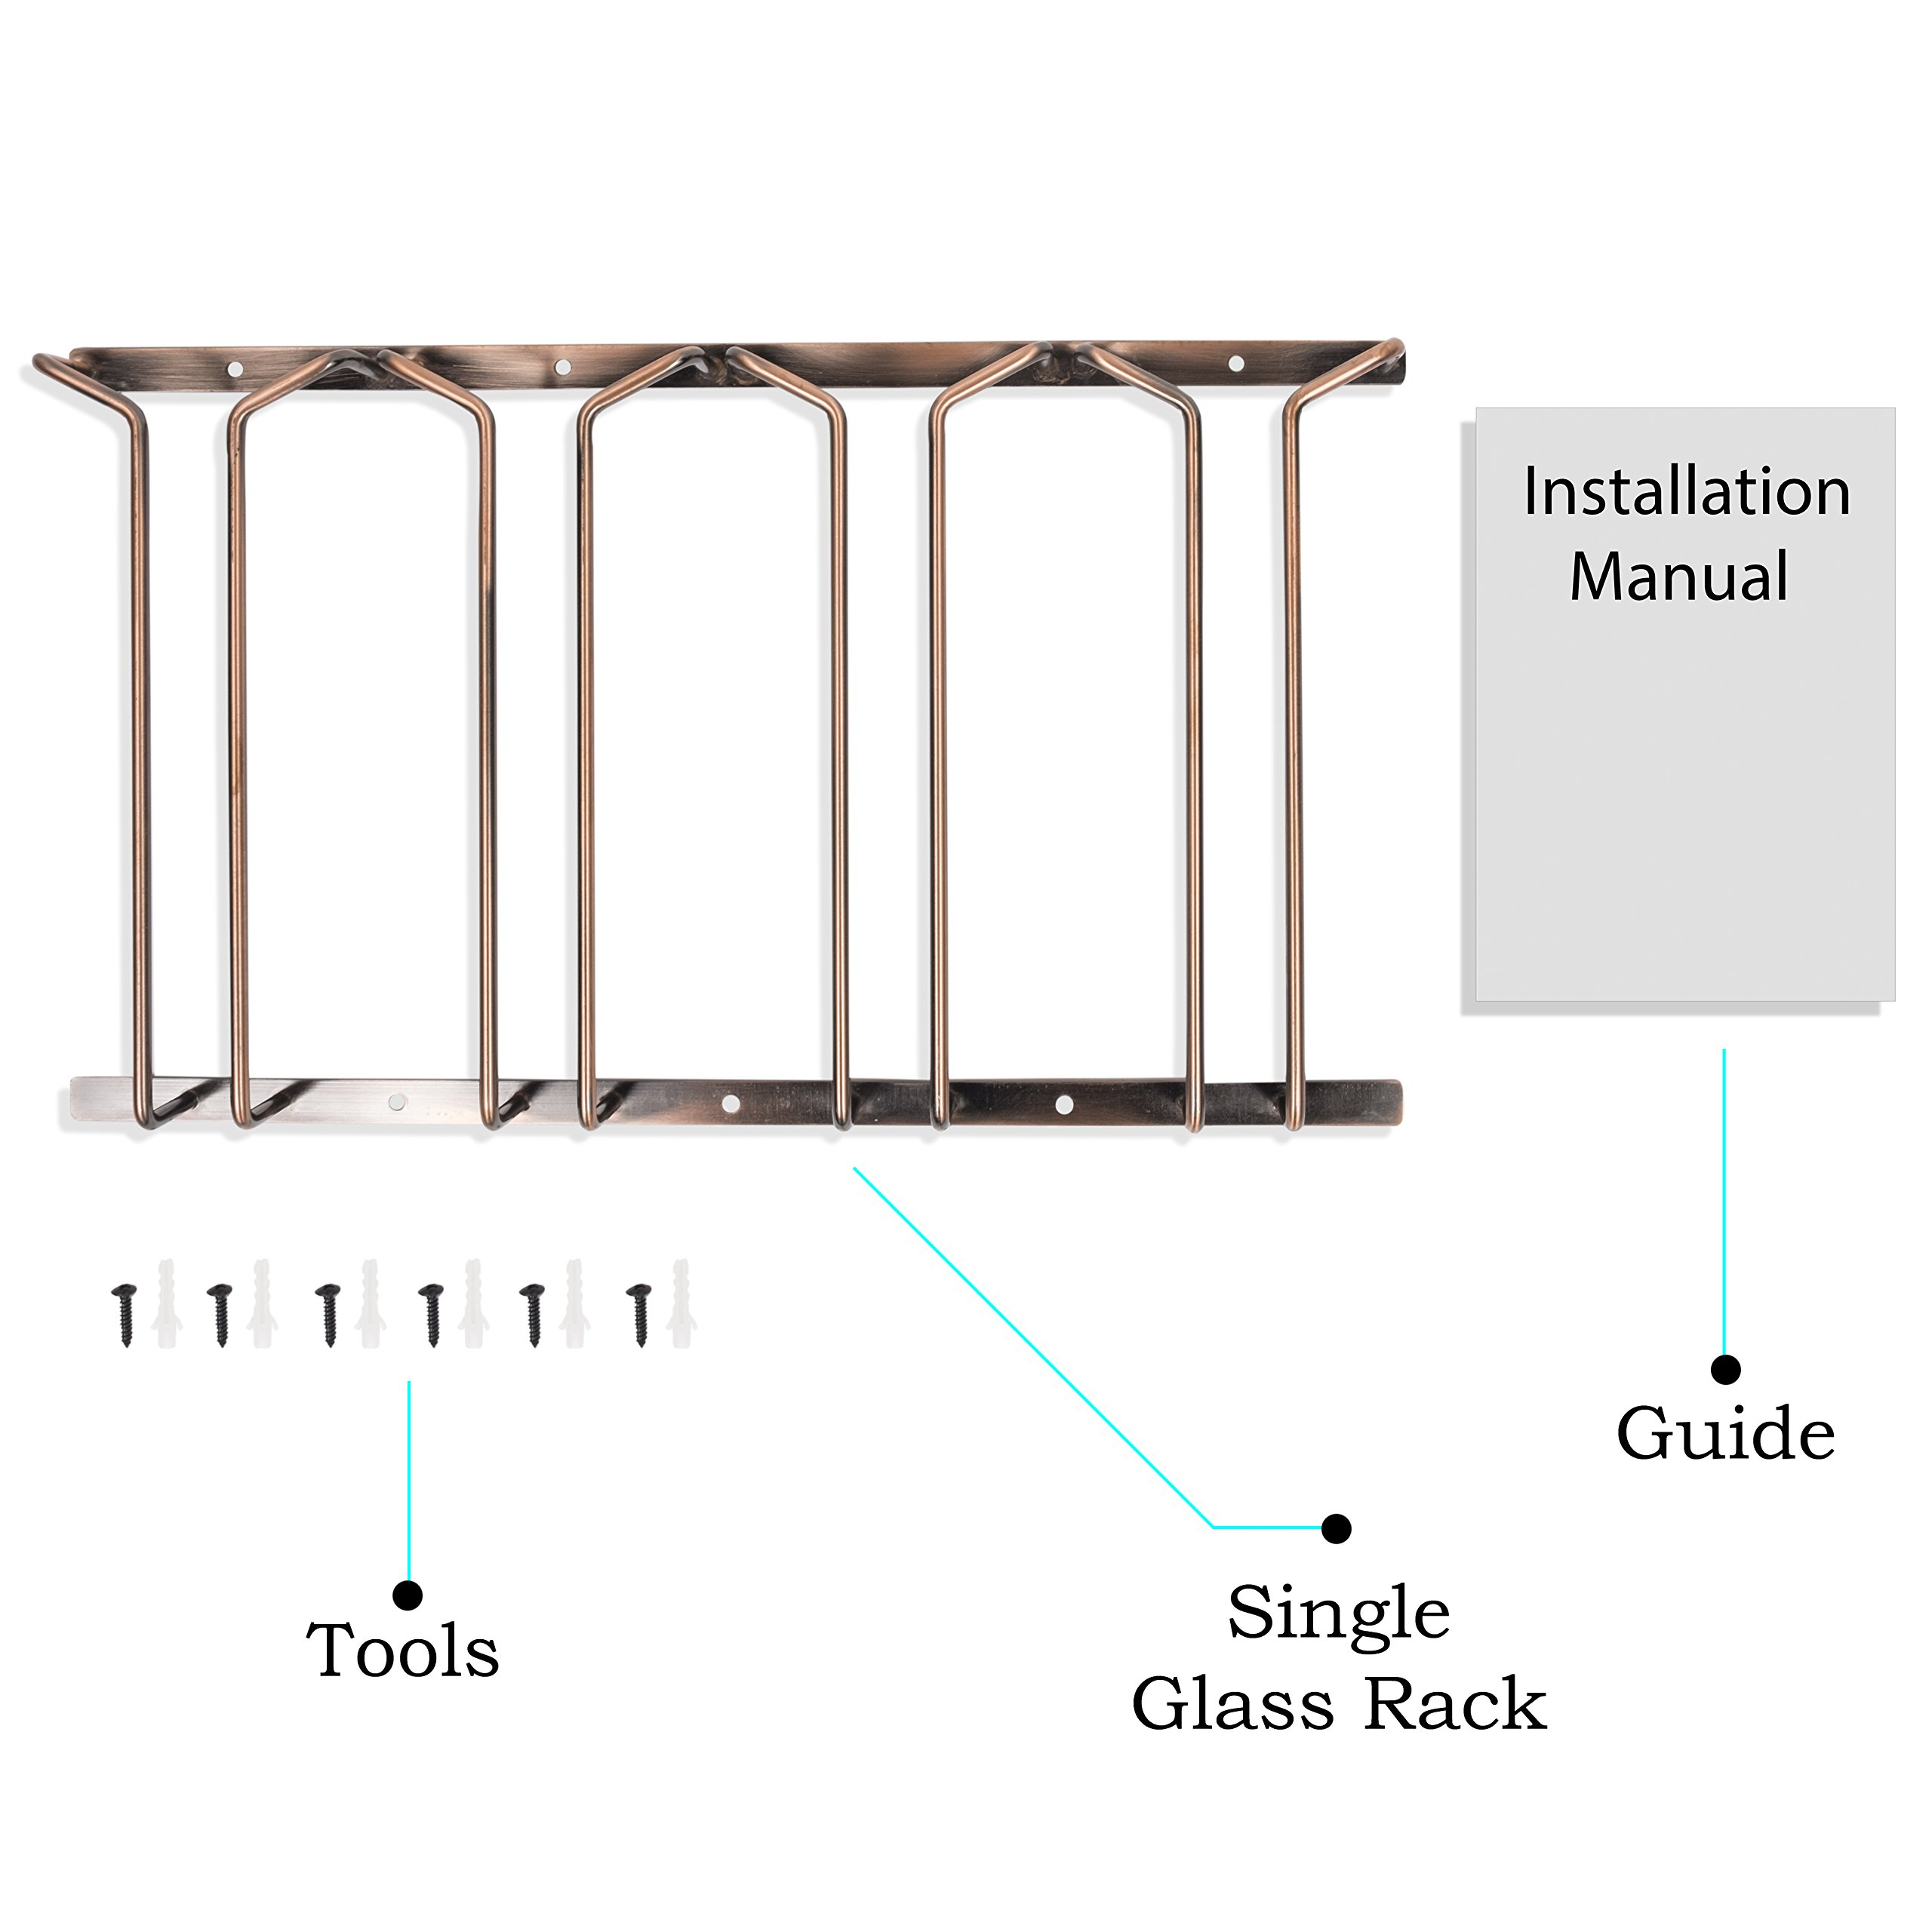 Wallniture Stemware Wine Glass Rack Holder Under Cabinet Storage Oil Rubbed Finish 10 Inch Deep by Wallniture